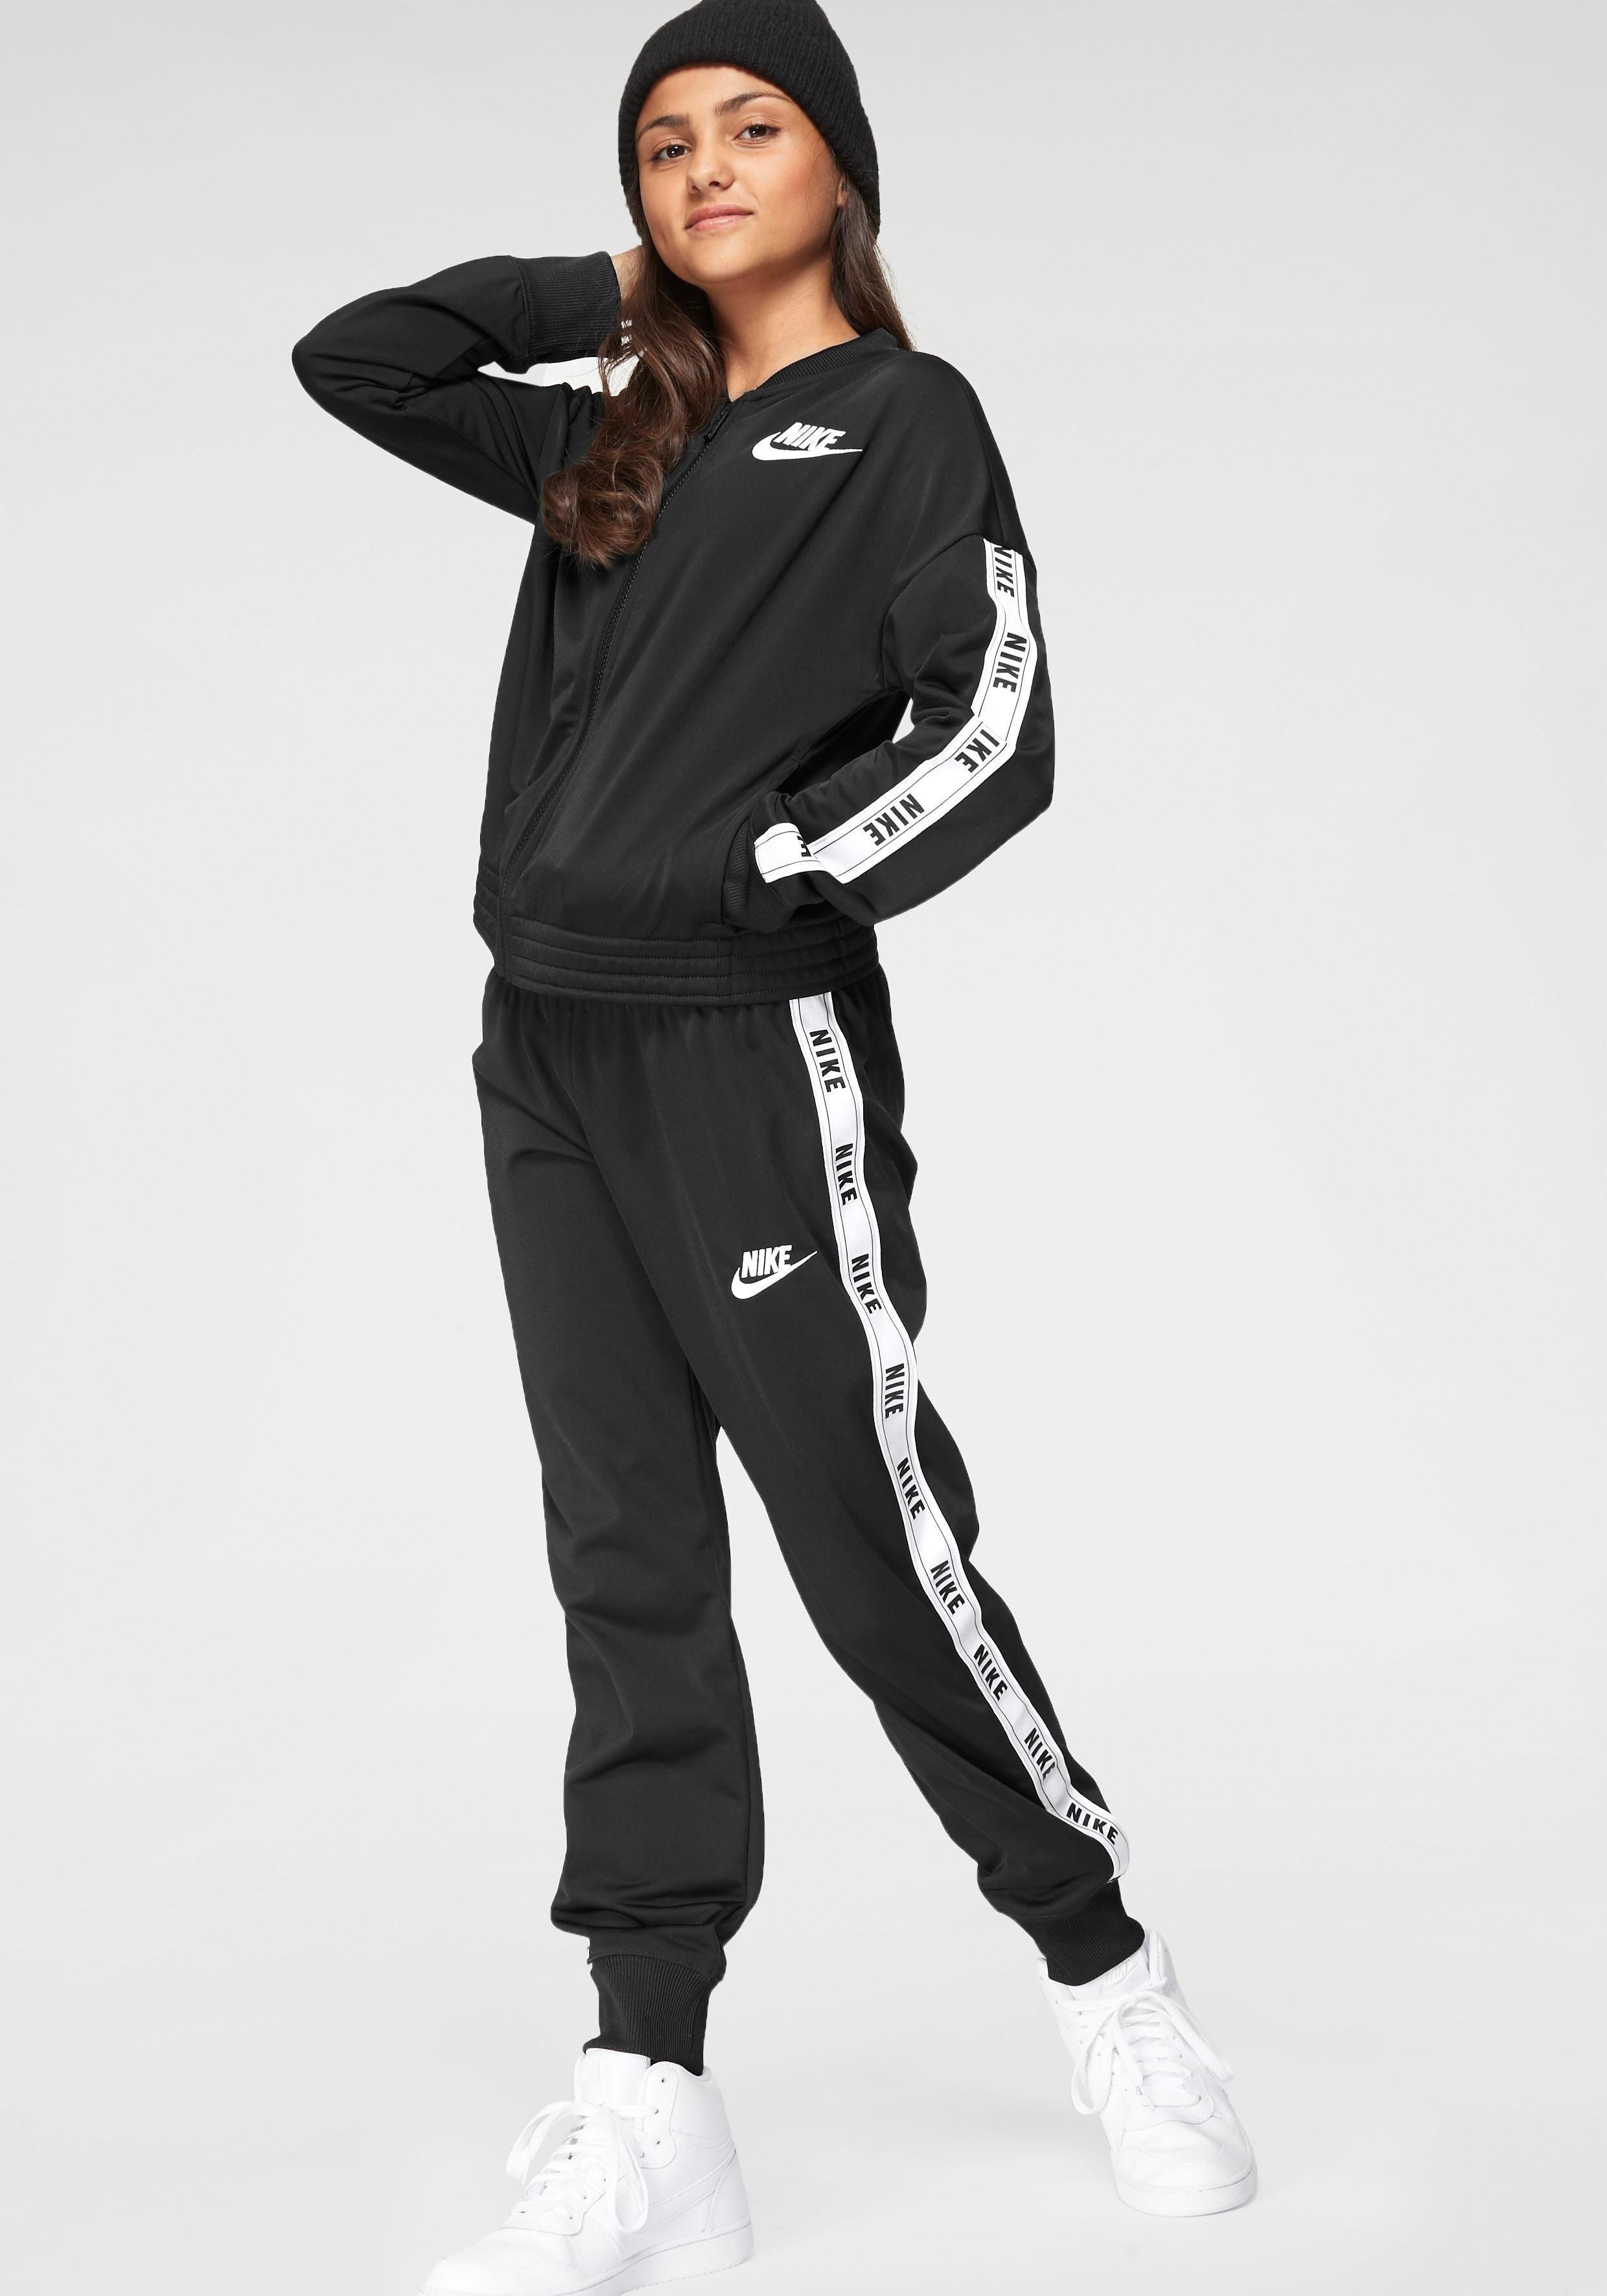 Nike Sportswear Trainingsanzug »GIRLS NIKE SPORTSWEAR TRACKSUIT TRICOT« (Set, 2 tlg) online kaufen | OTTO